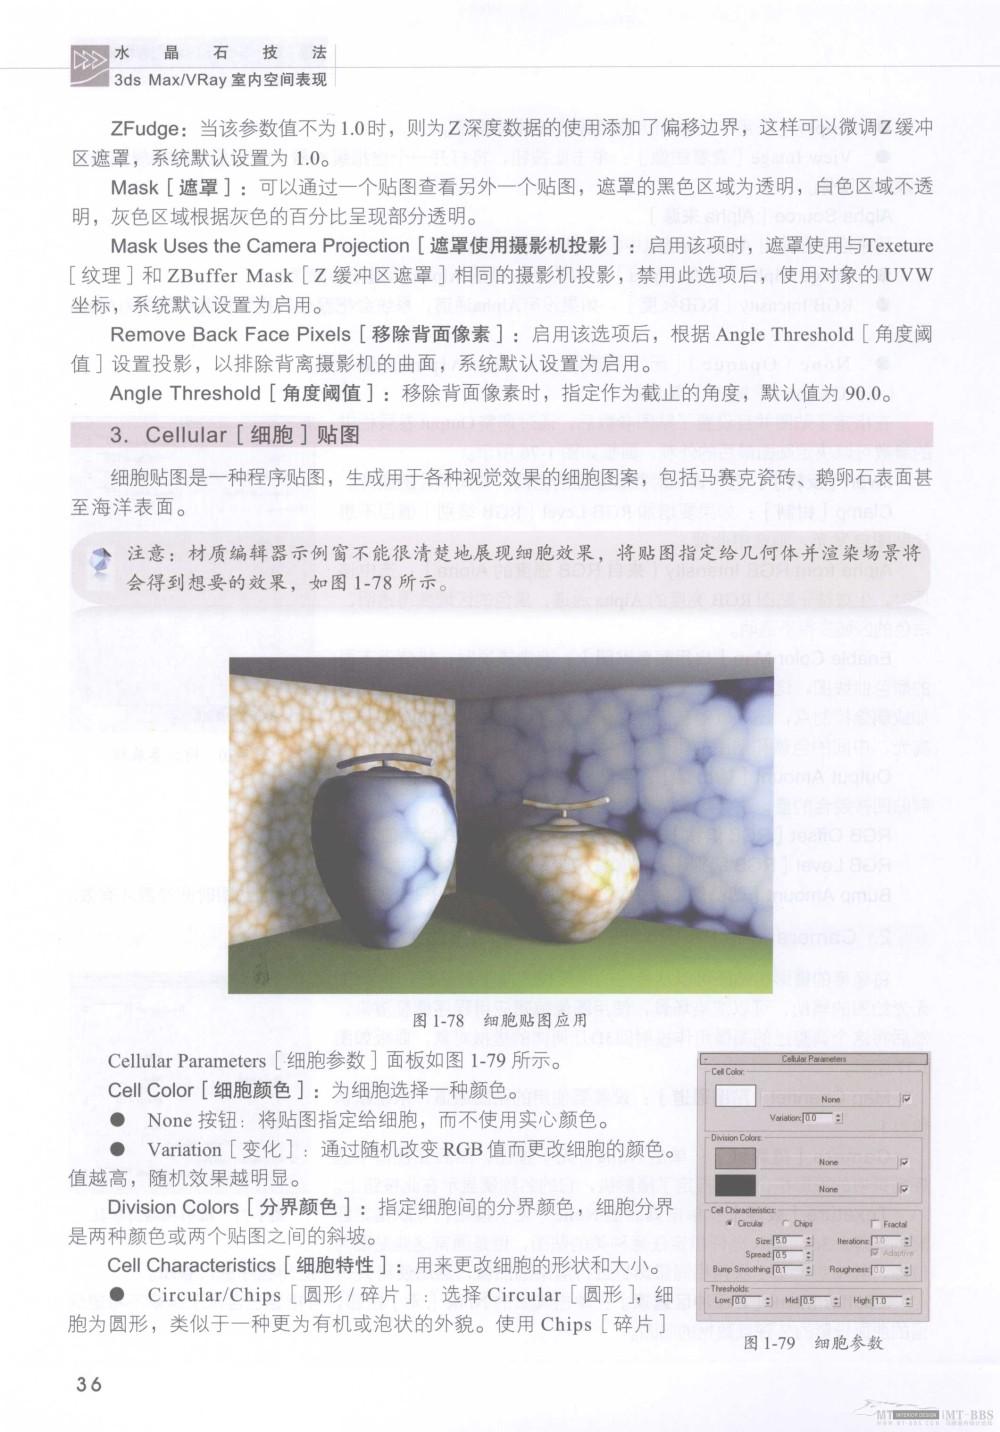 水晶石技法-3ds_Max&VRay室内空间表现_水晶石技法-3ds_Max&VRay室内空间表现_页面_042.jpg